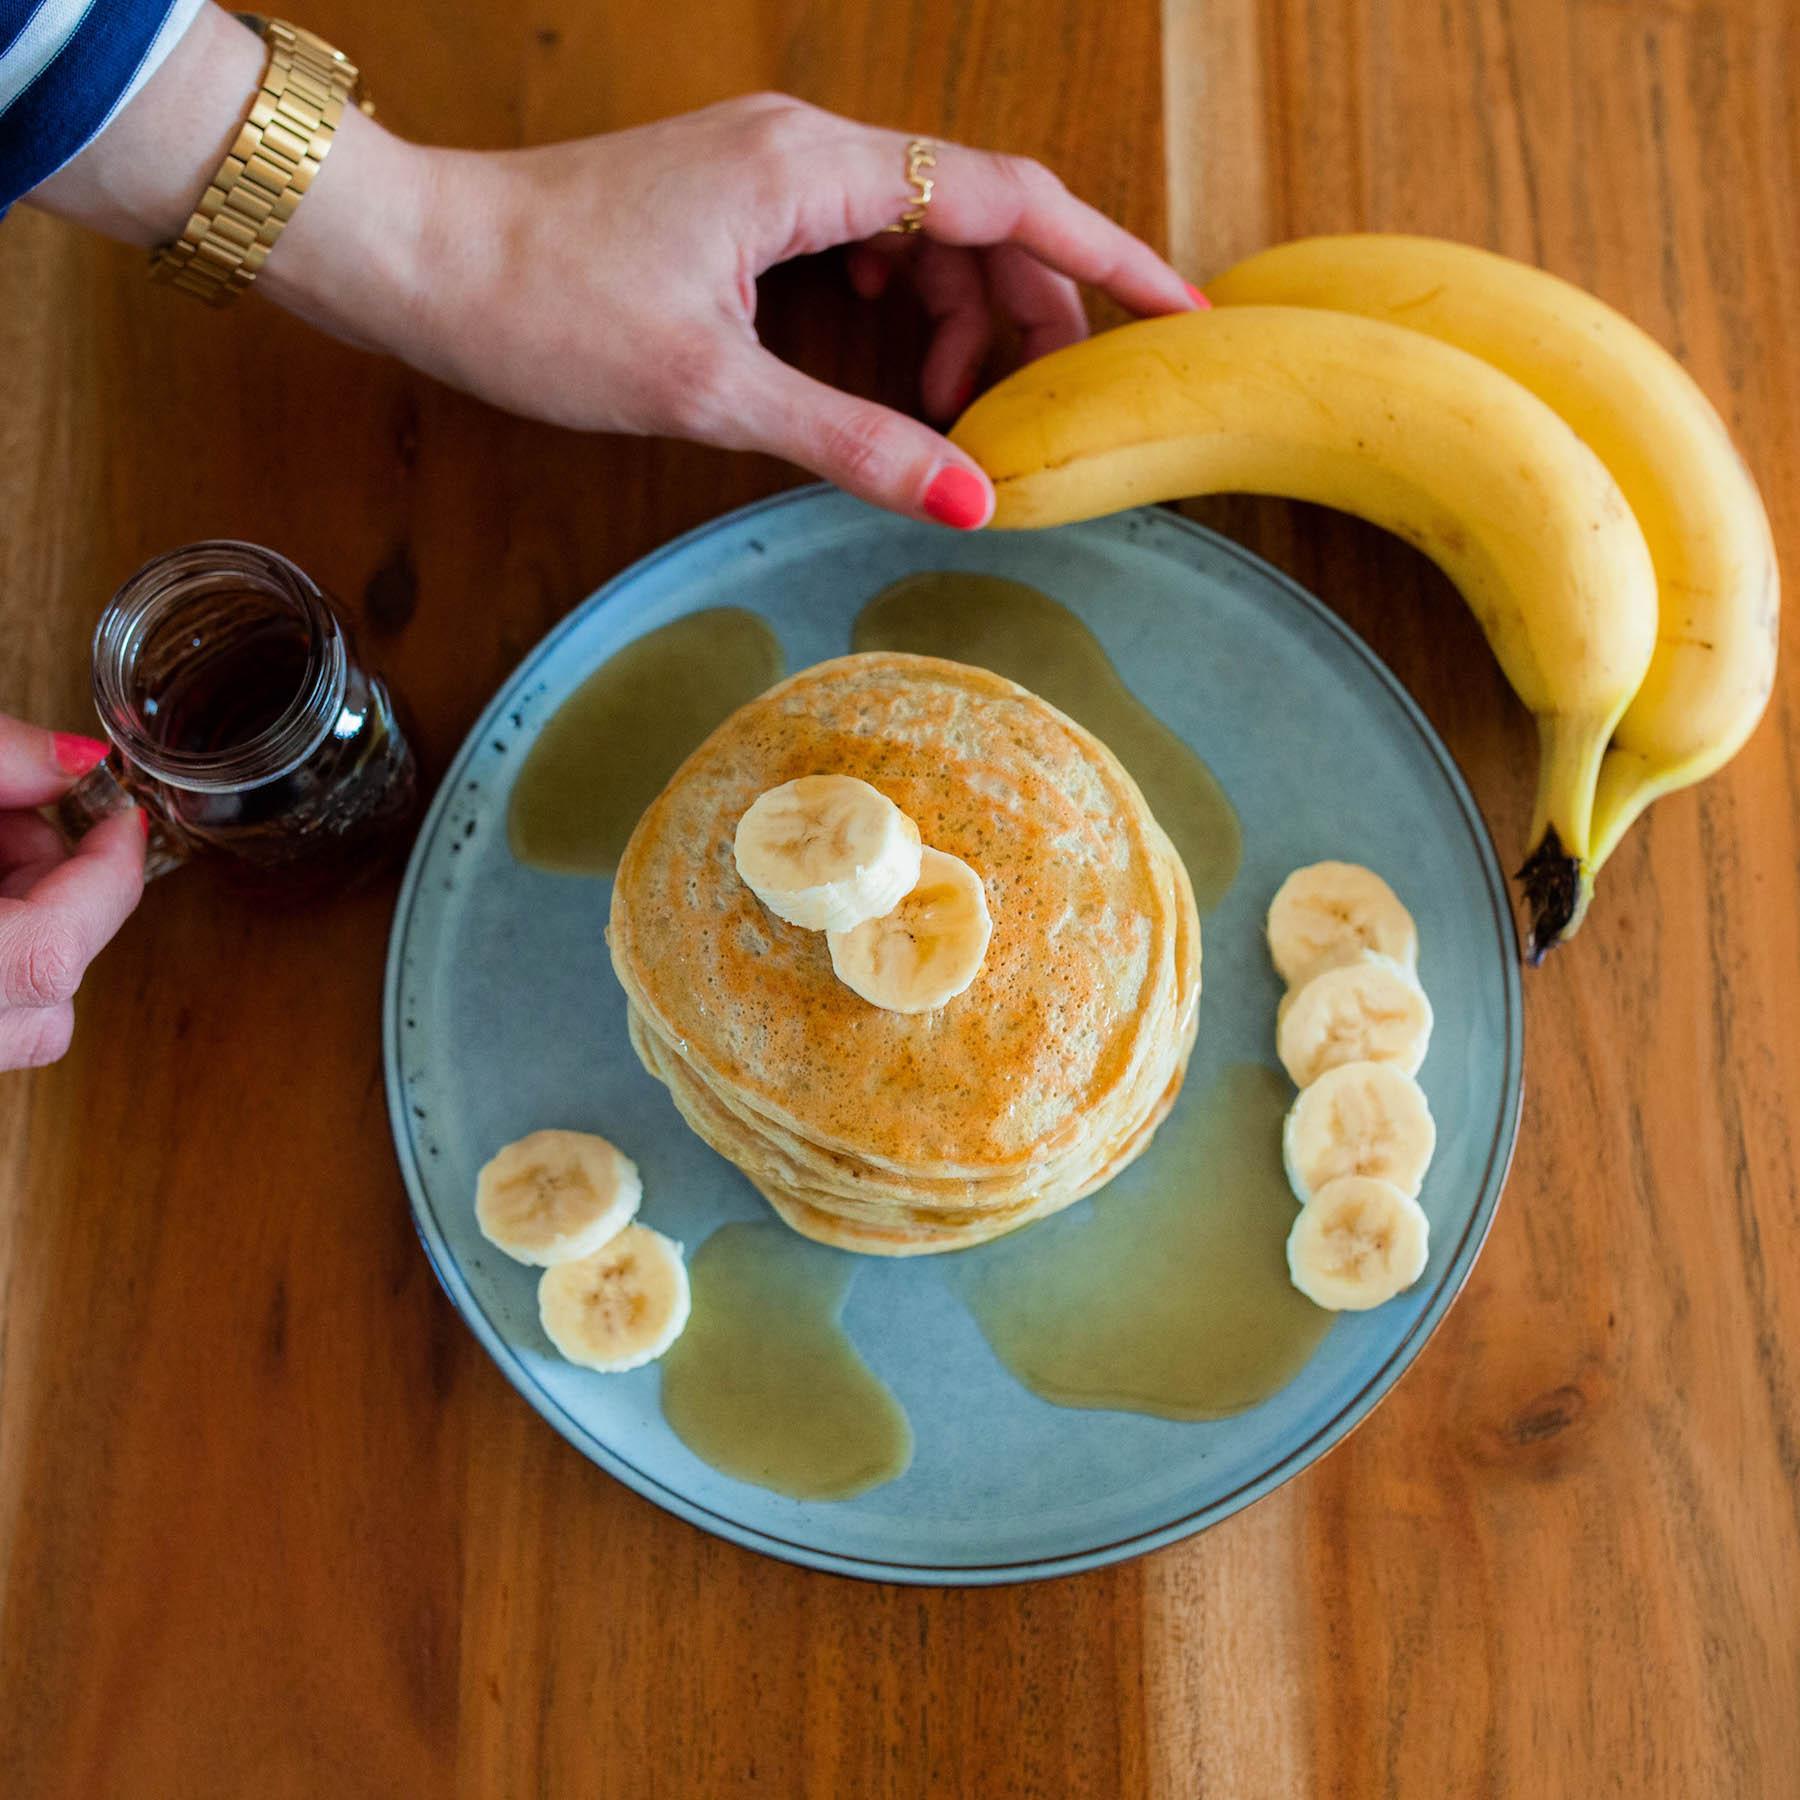 banana pancakes glutenfreie bananen pancakes rezept suelovesnyc_schaer_banana_pancakes_glutenfreie_bananen_pancakes_rezept_glutenfrei